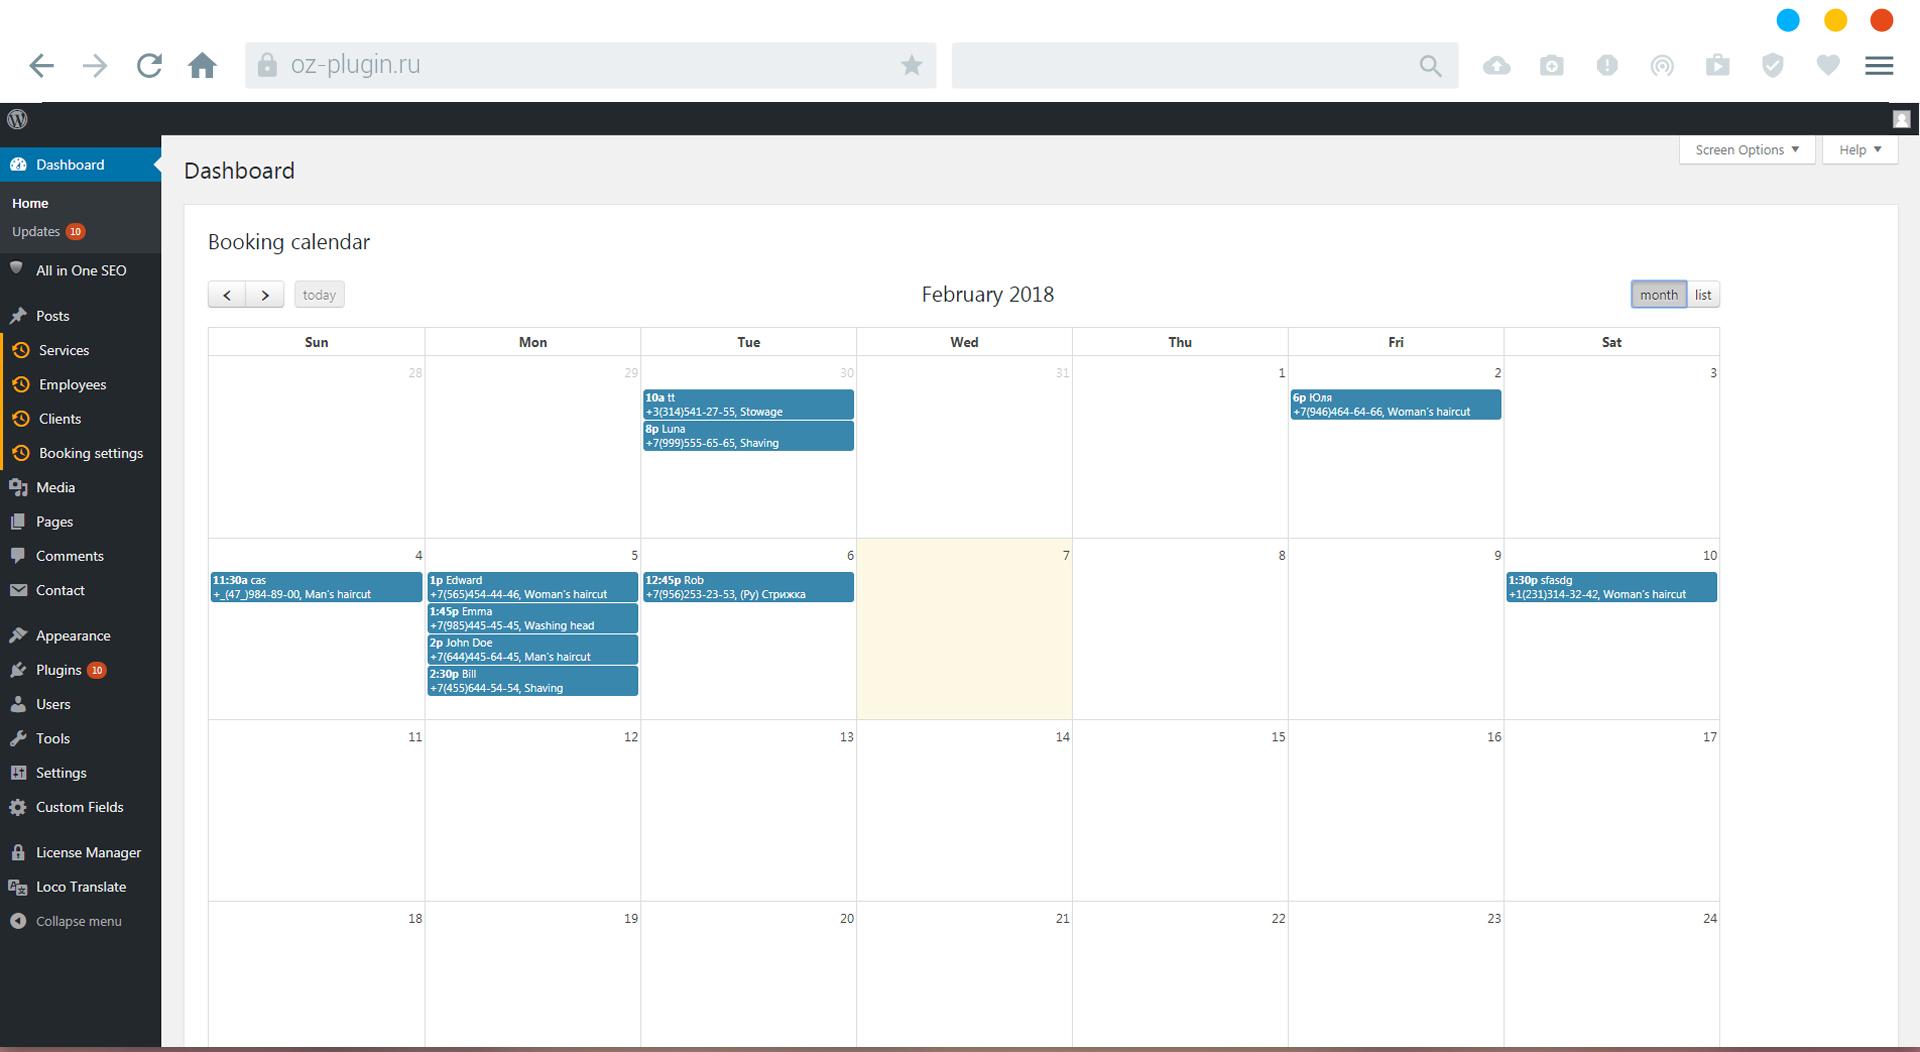 Dashboard WP. Calendar view